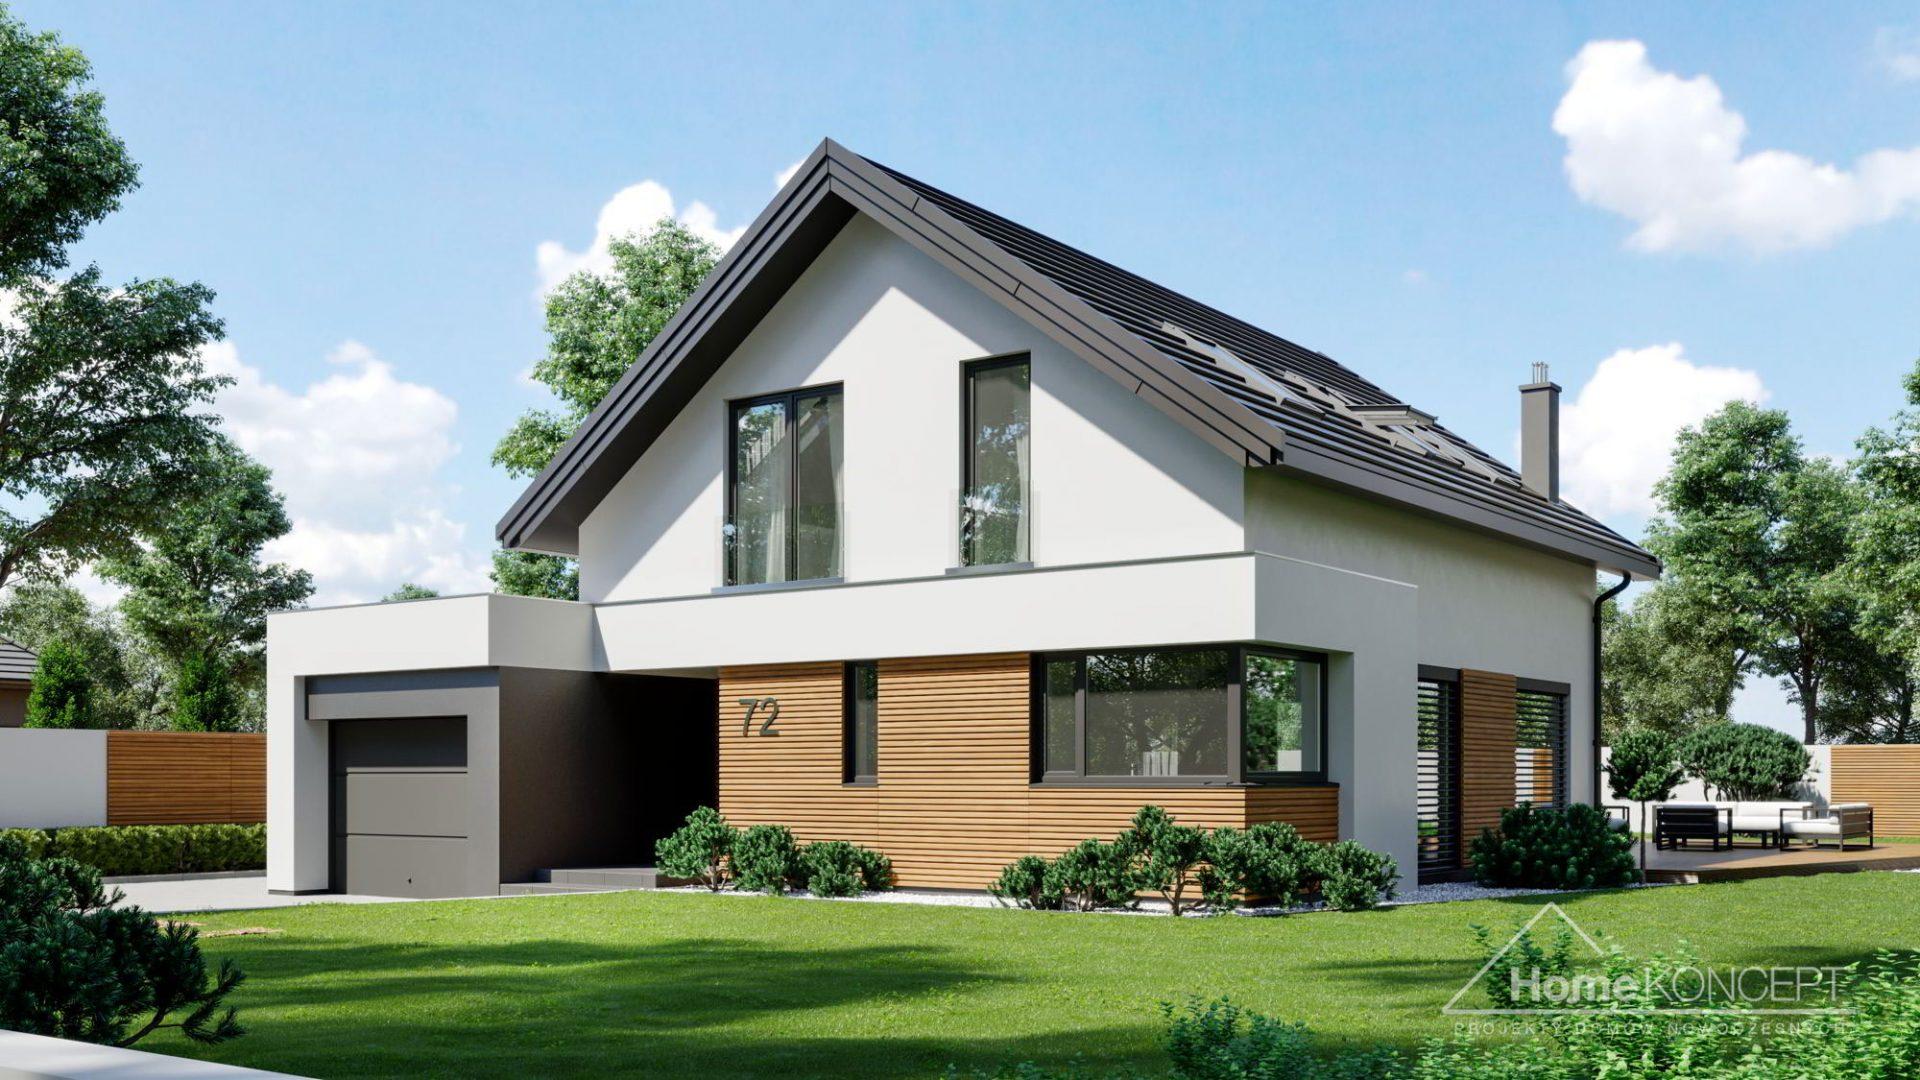 HomeKONCEPT 72 projekt domu parterowego